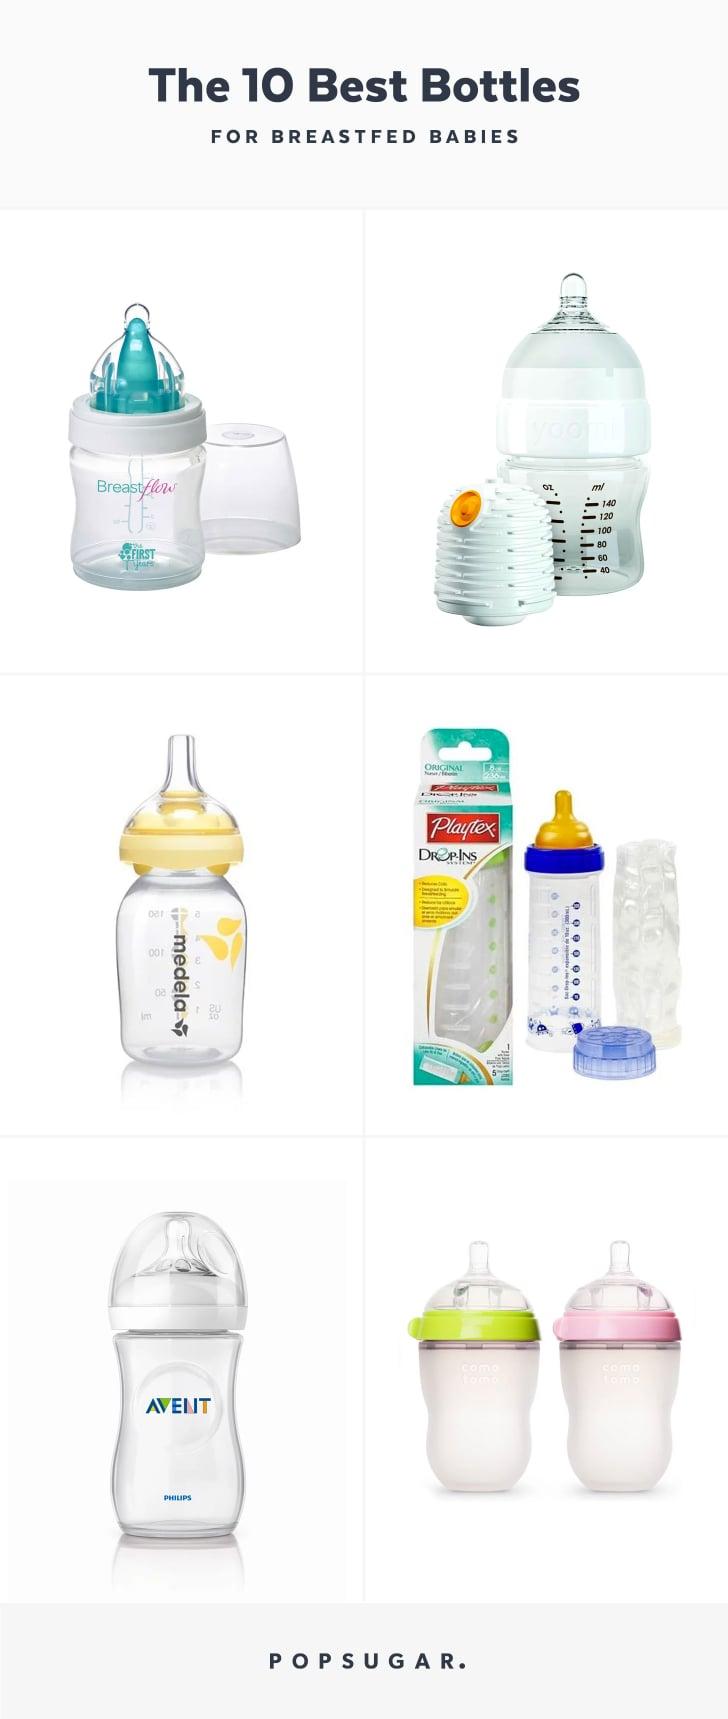 The Best Bottles For Breastfed Babies 2020